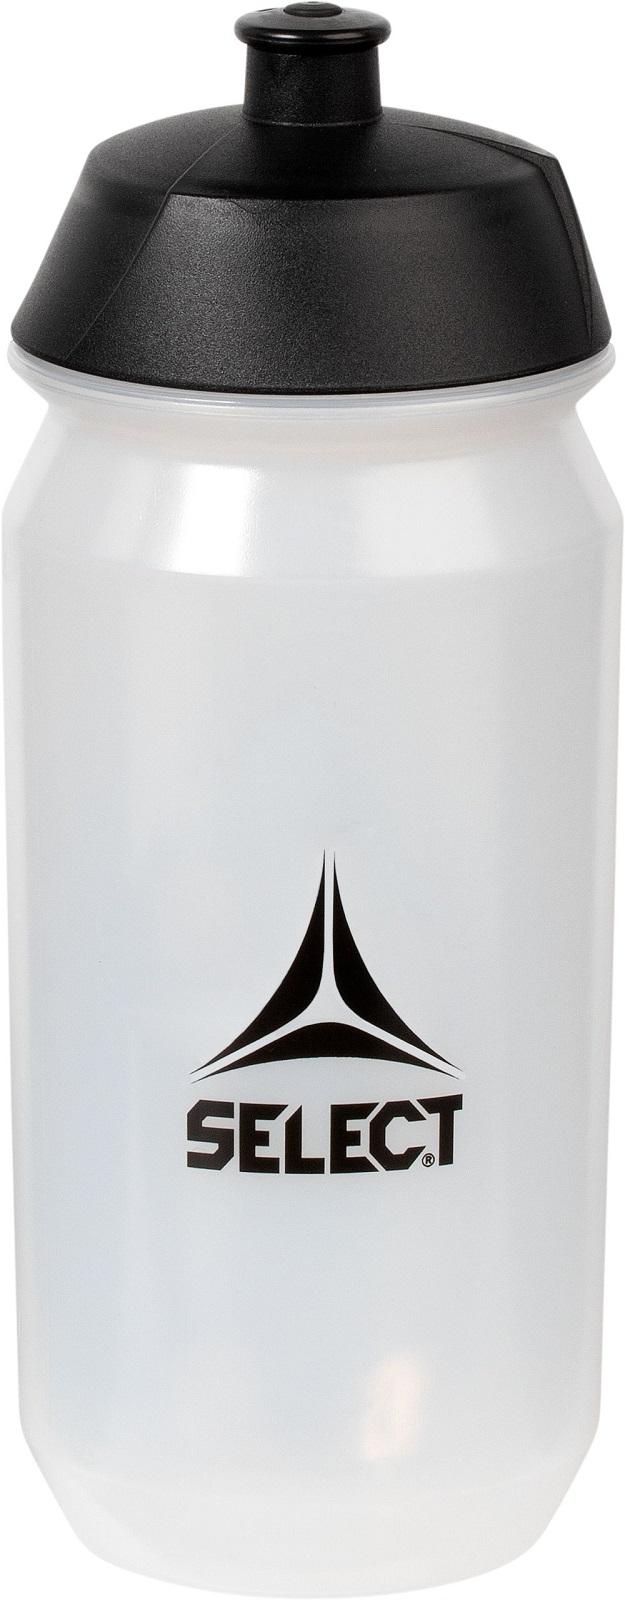 SELECT Trinkflasche Bio-Bottle 0,5l